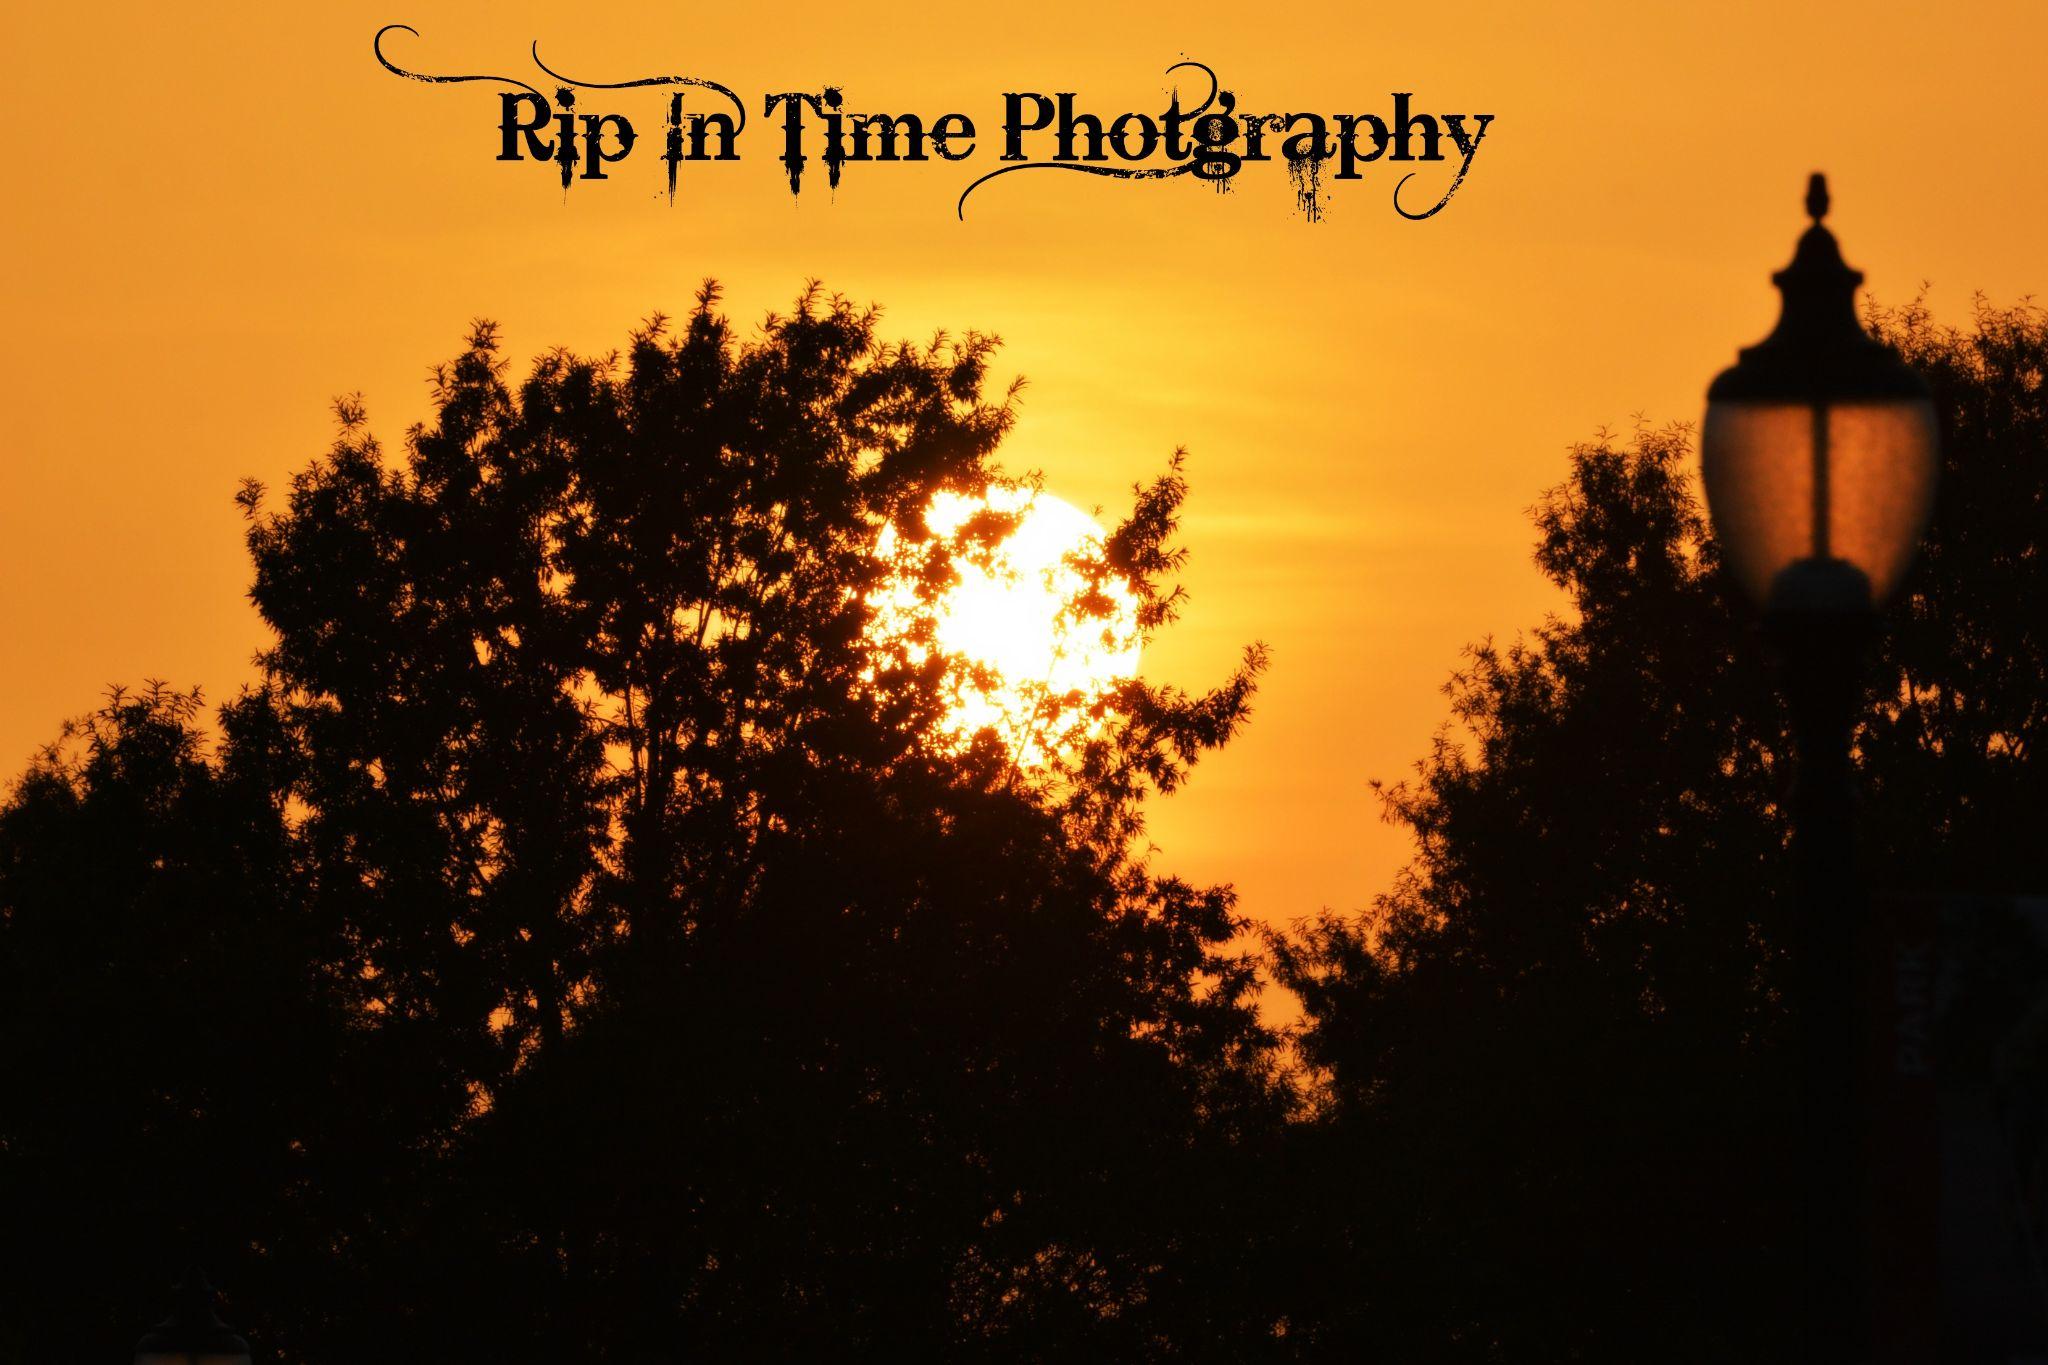 Sunset in arkansas by Kent Ripley